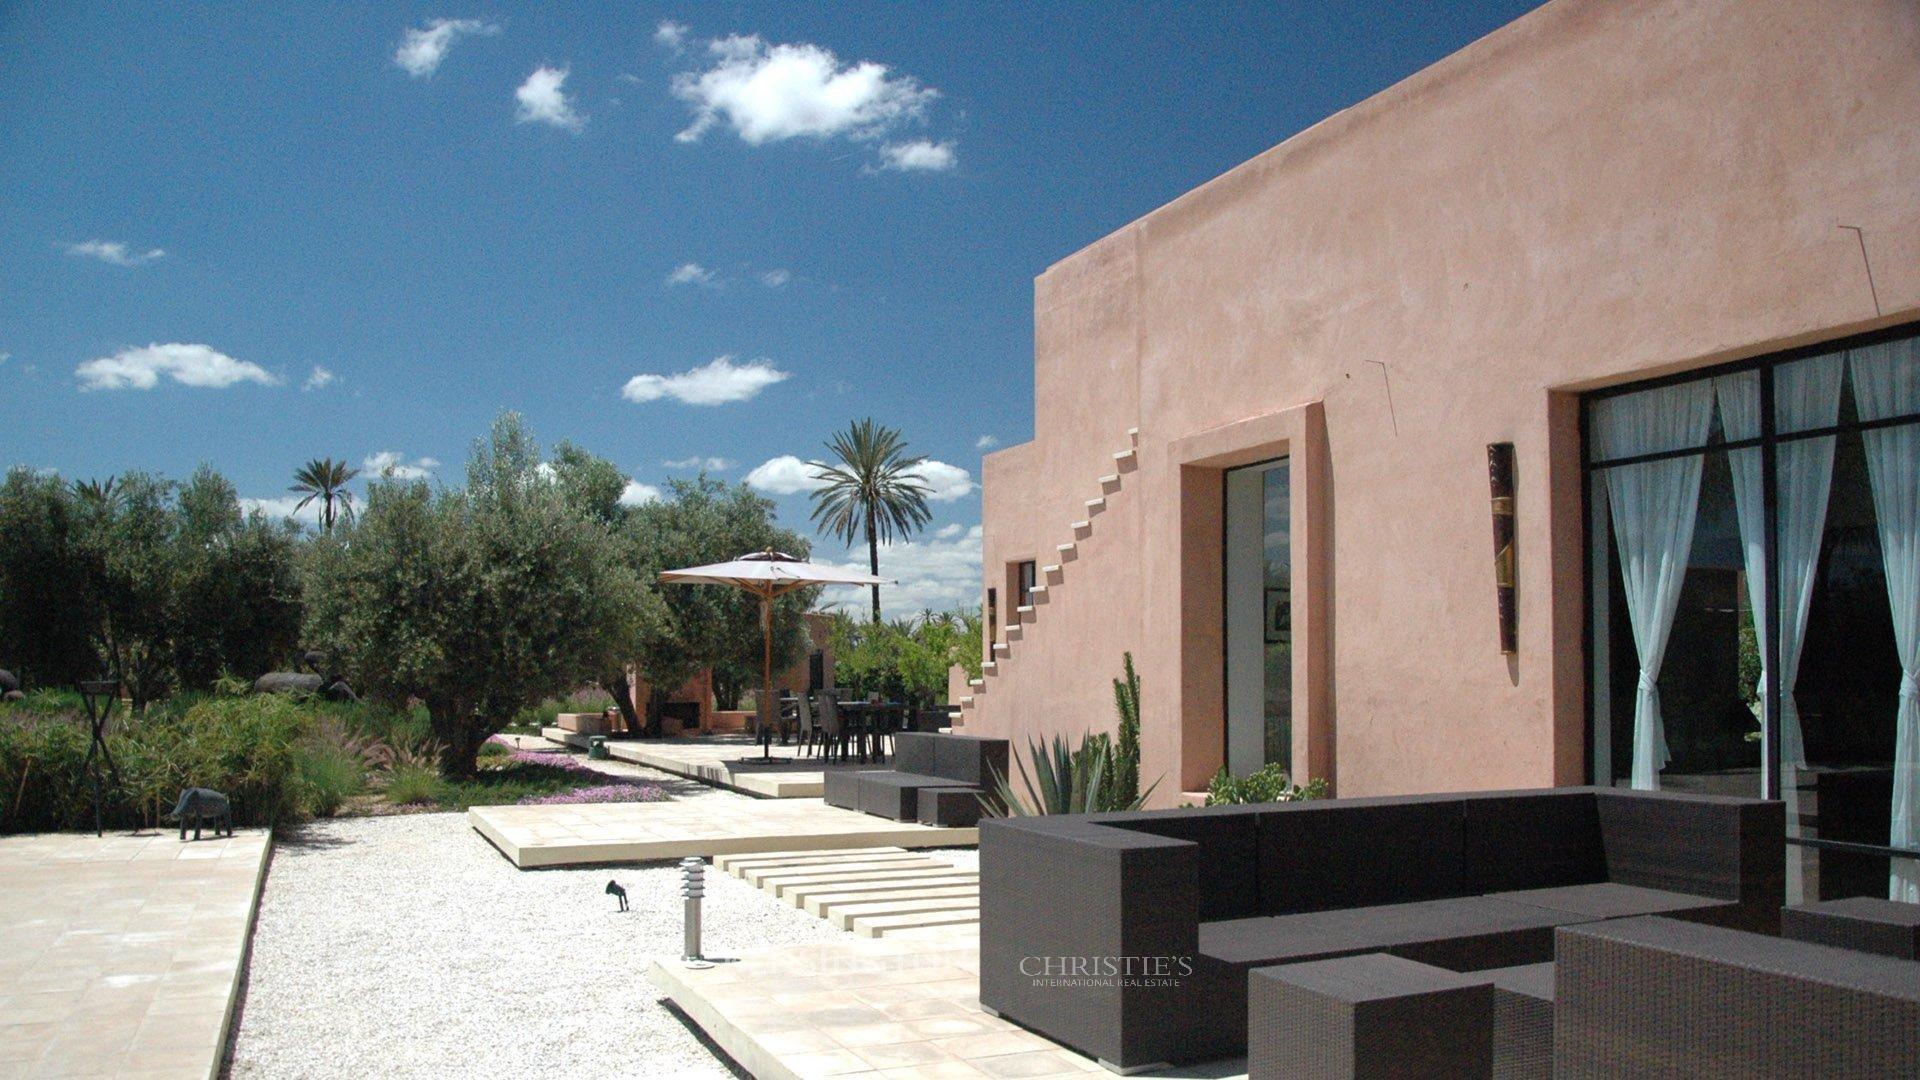 KPPM00573: Draconis Villa Luxury Villa Marrakech Morocco